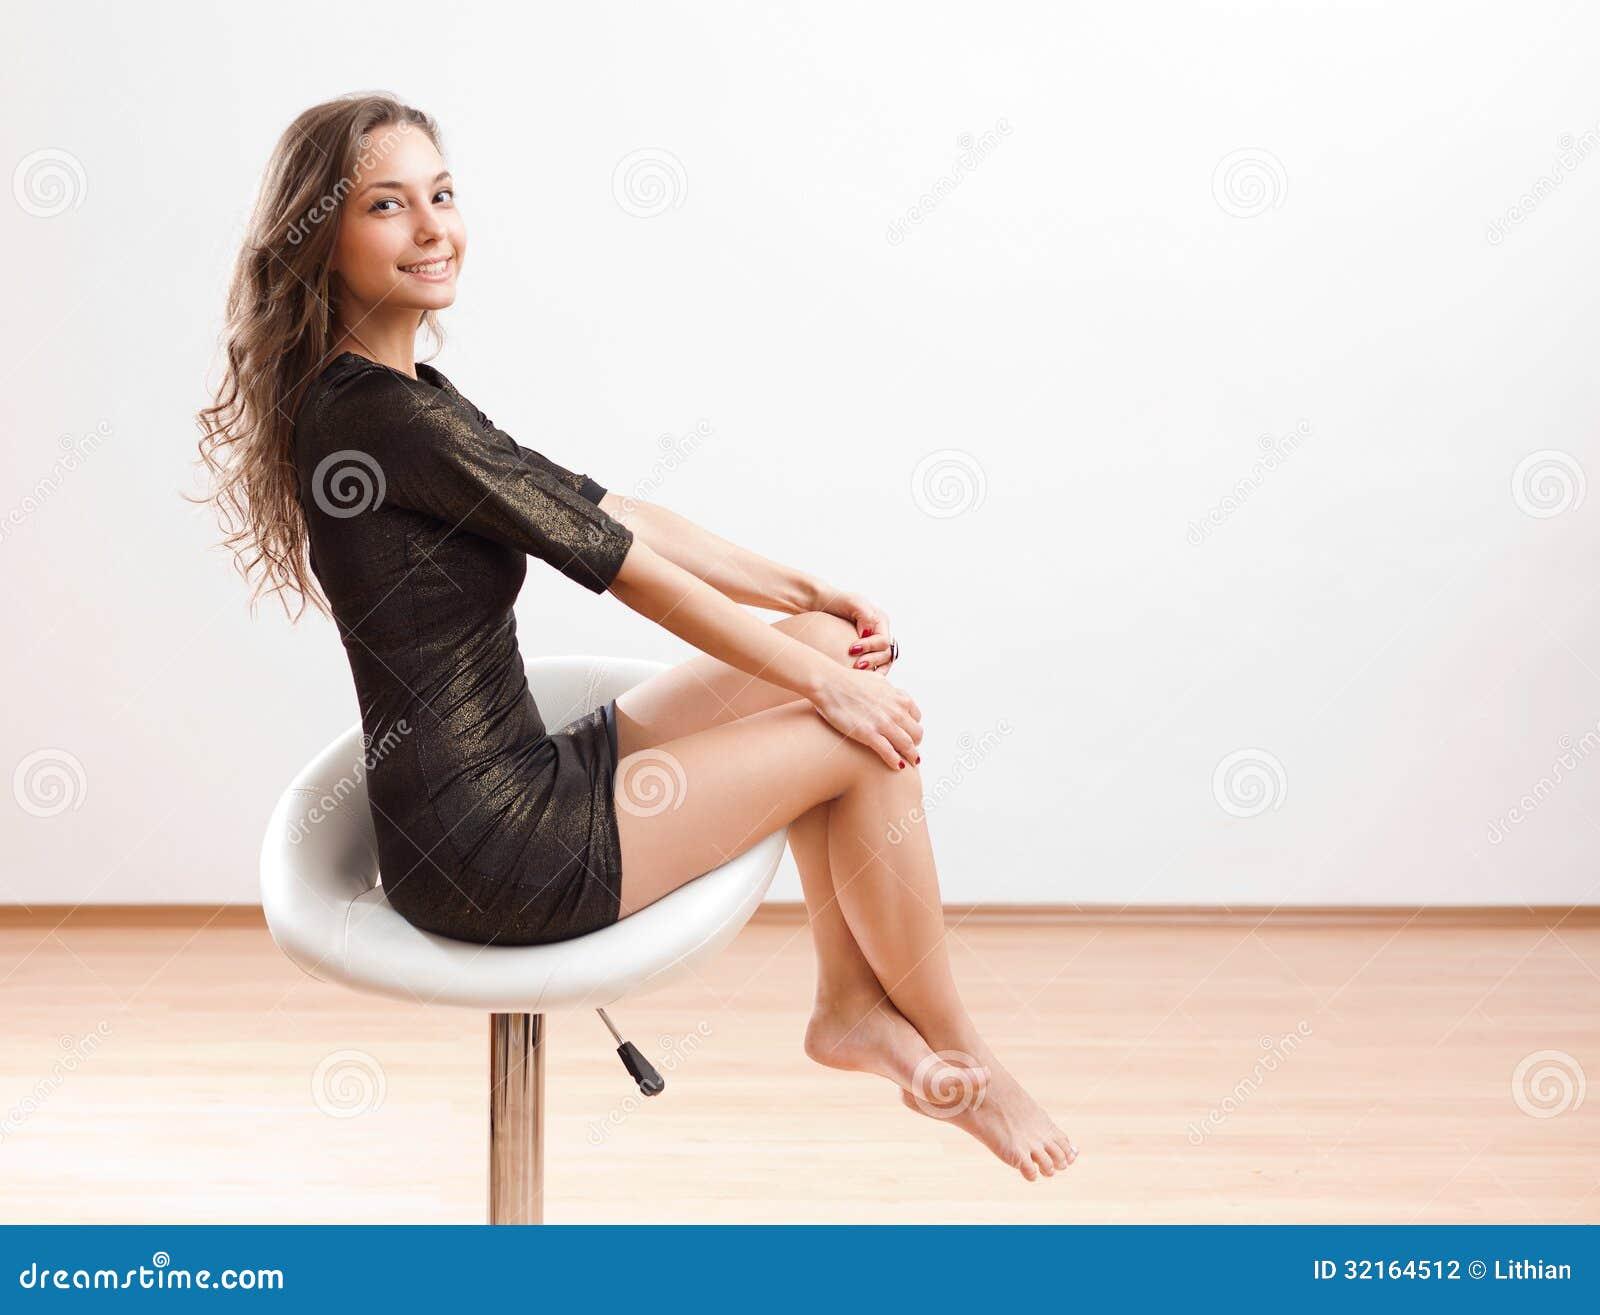 bar stool bar stool vect kingofficeus : gorgeous festive brunette slender young barefoot beauty posing white bar stool 32164512 from kingoffice.us size 1300 x 1085 jpeg 86kB